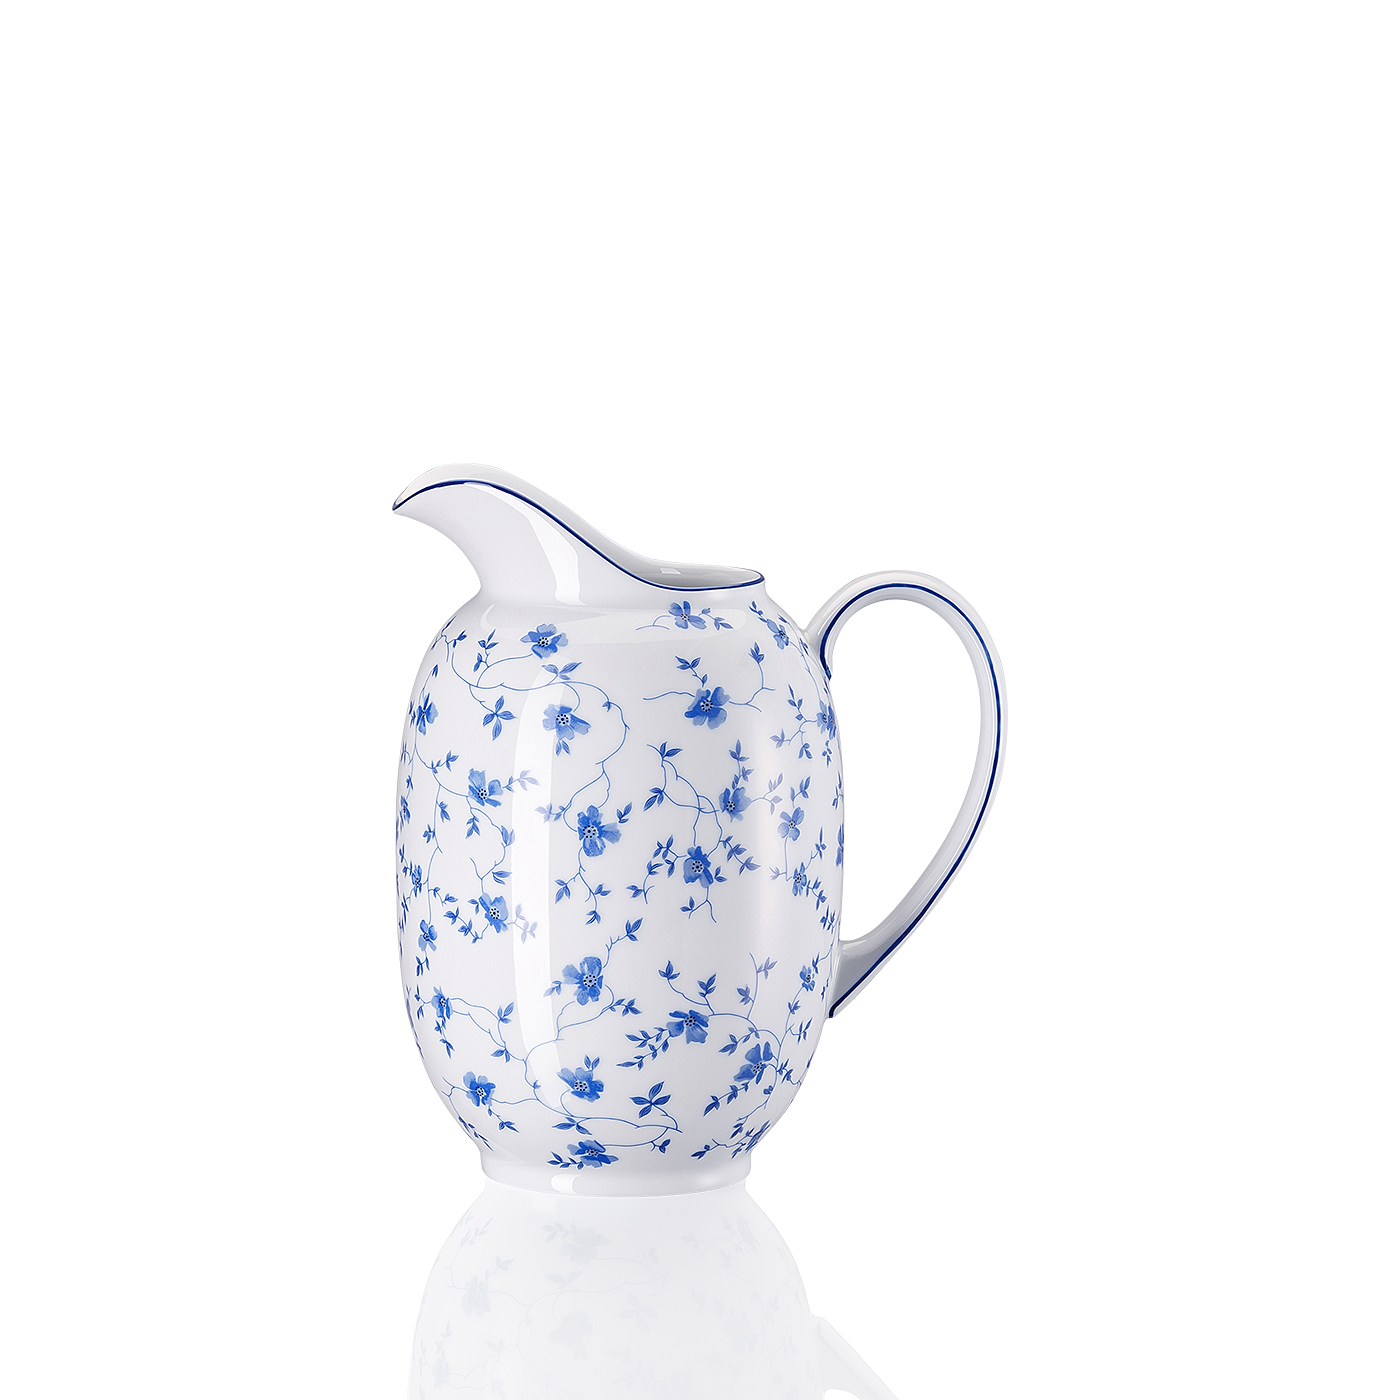 Krug Form 1382 Blaublüten Arzberg